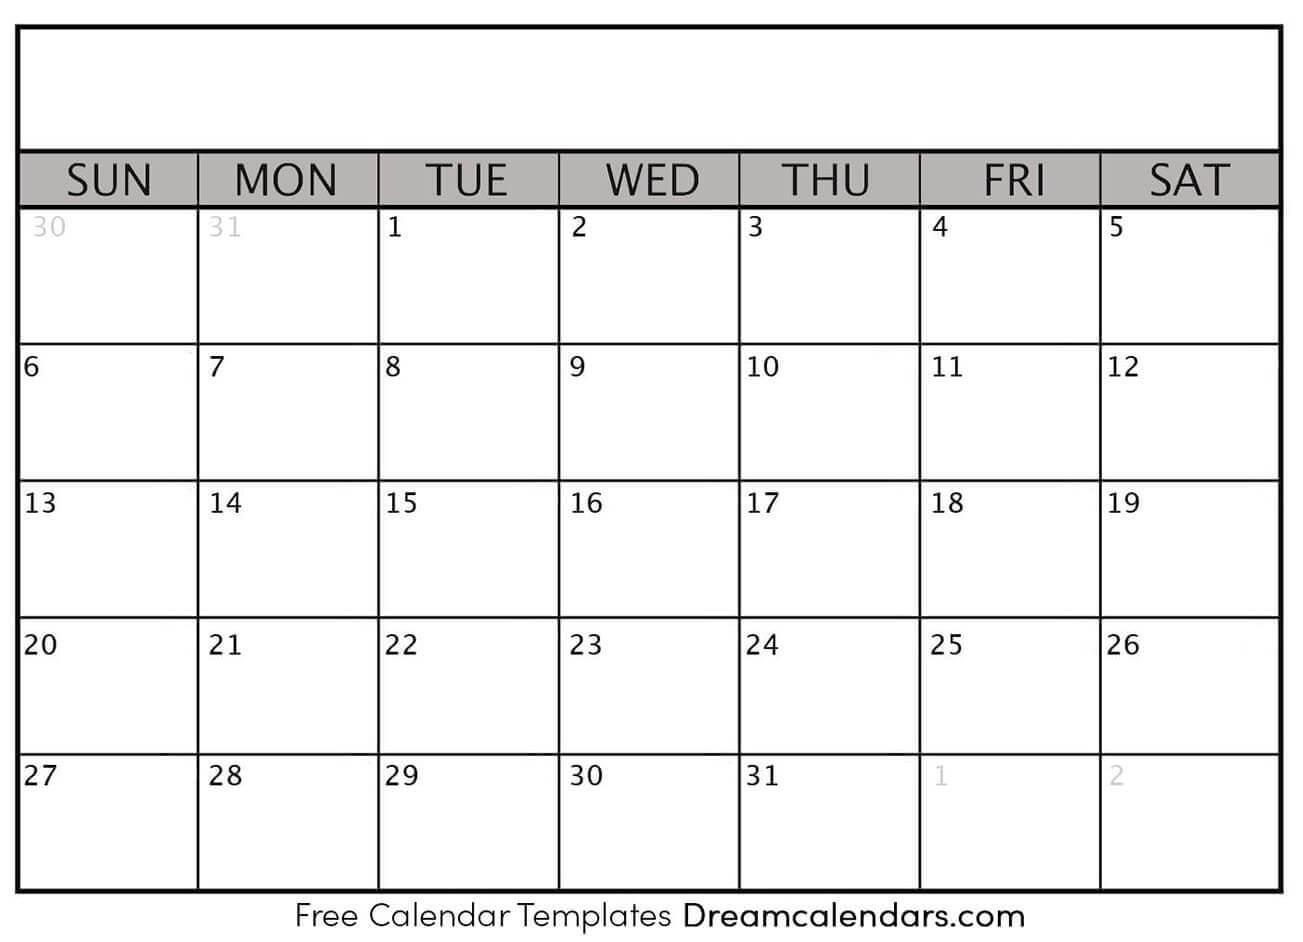 Printable Blank Calendar 2020 | Dream Calendars Intended For Blank One Month Calendar Template